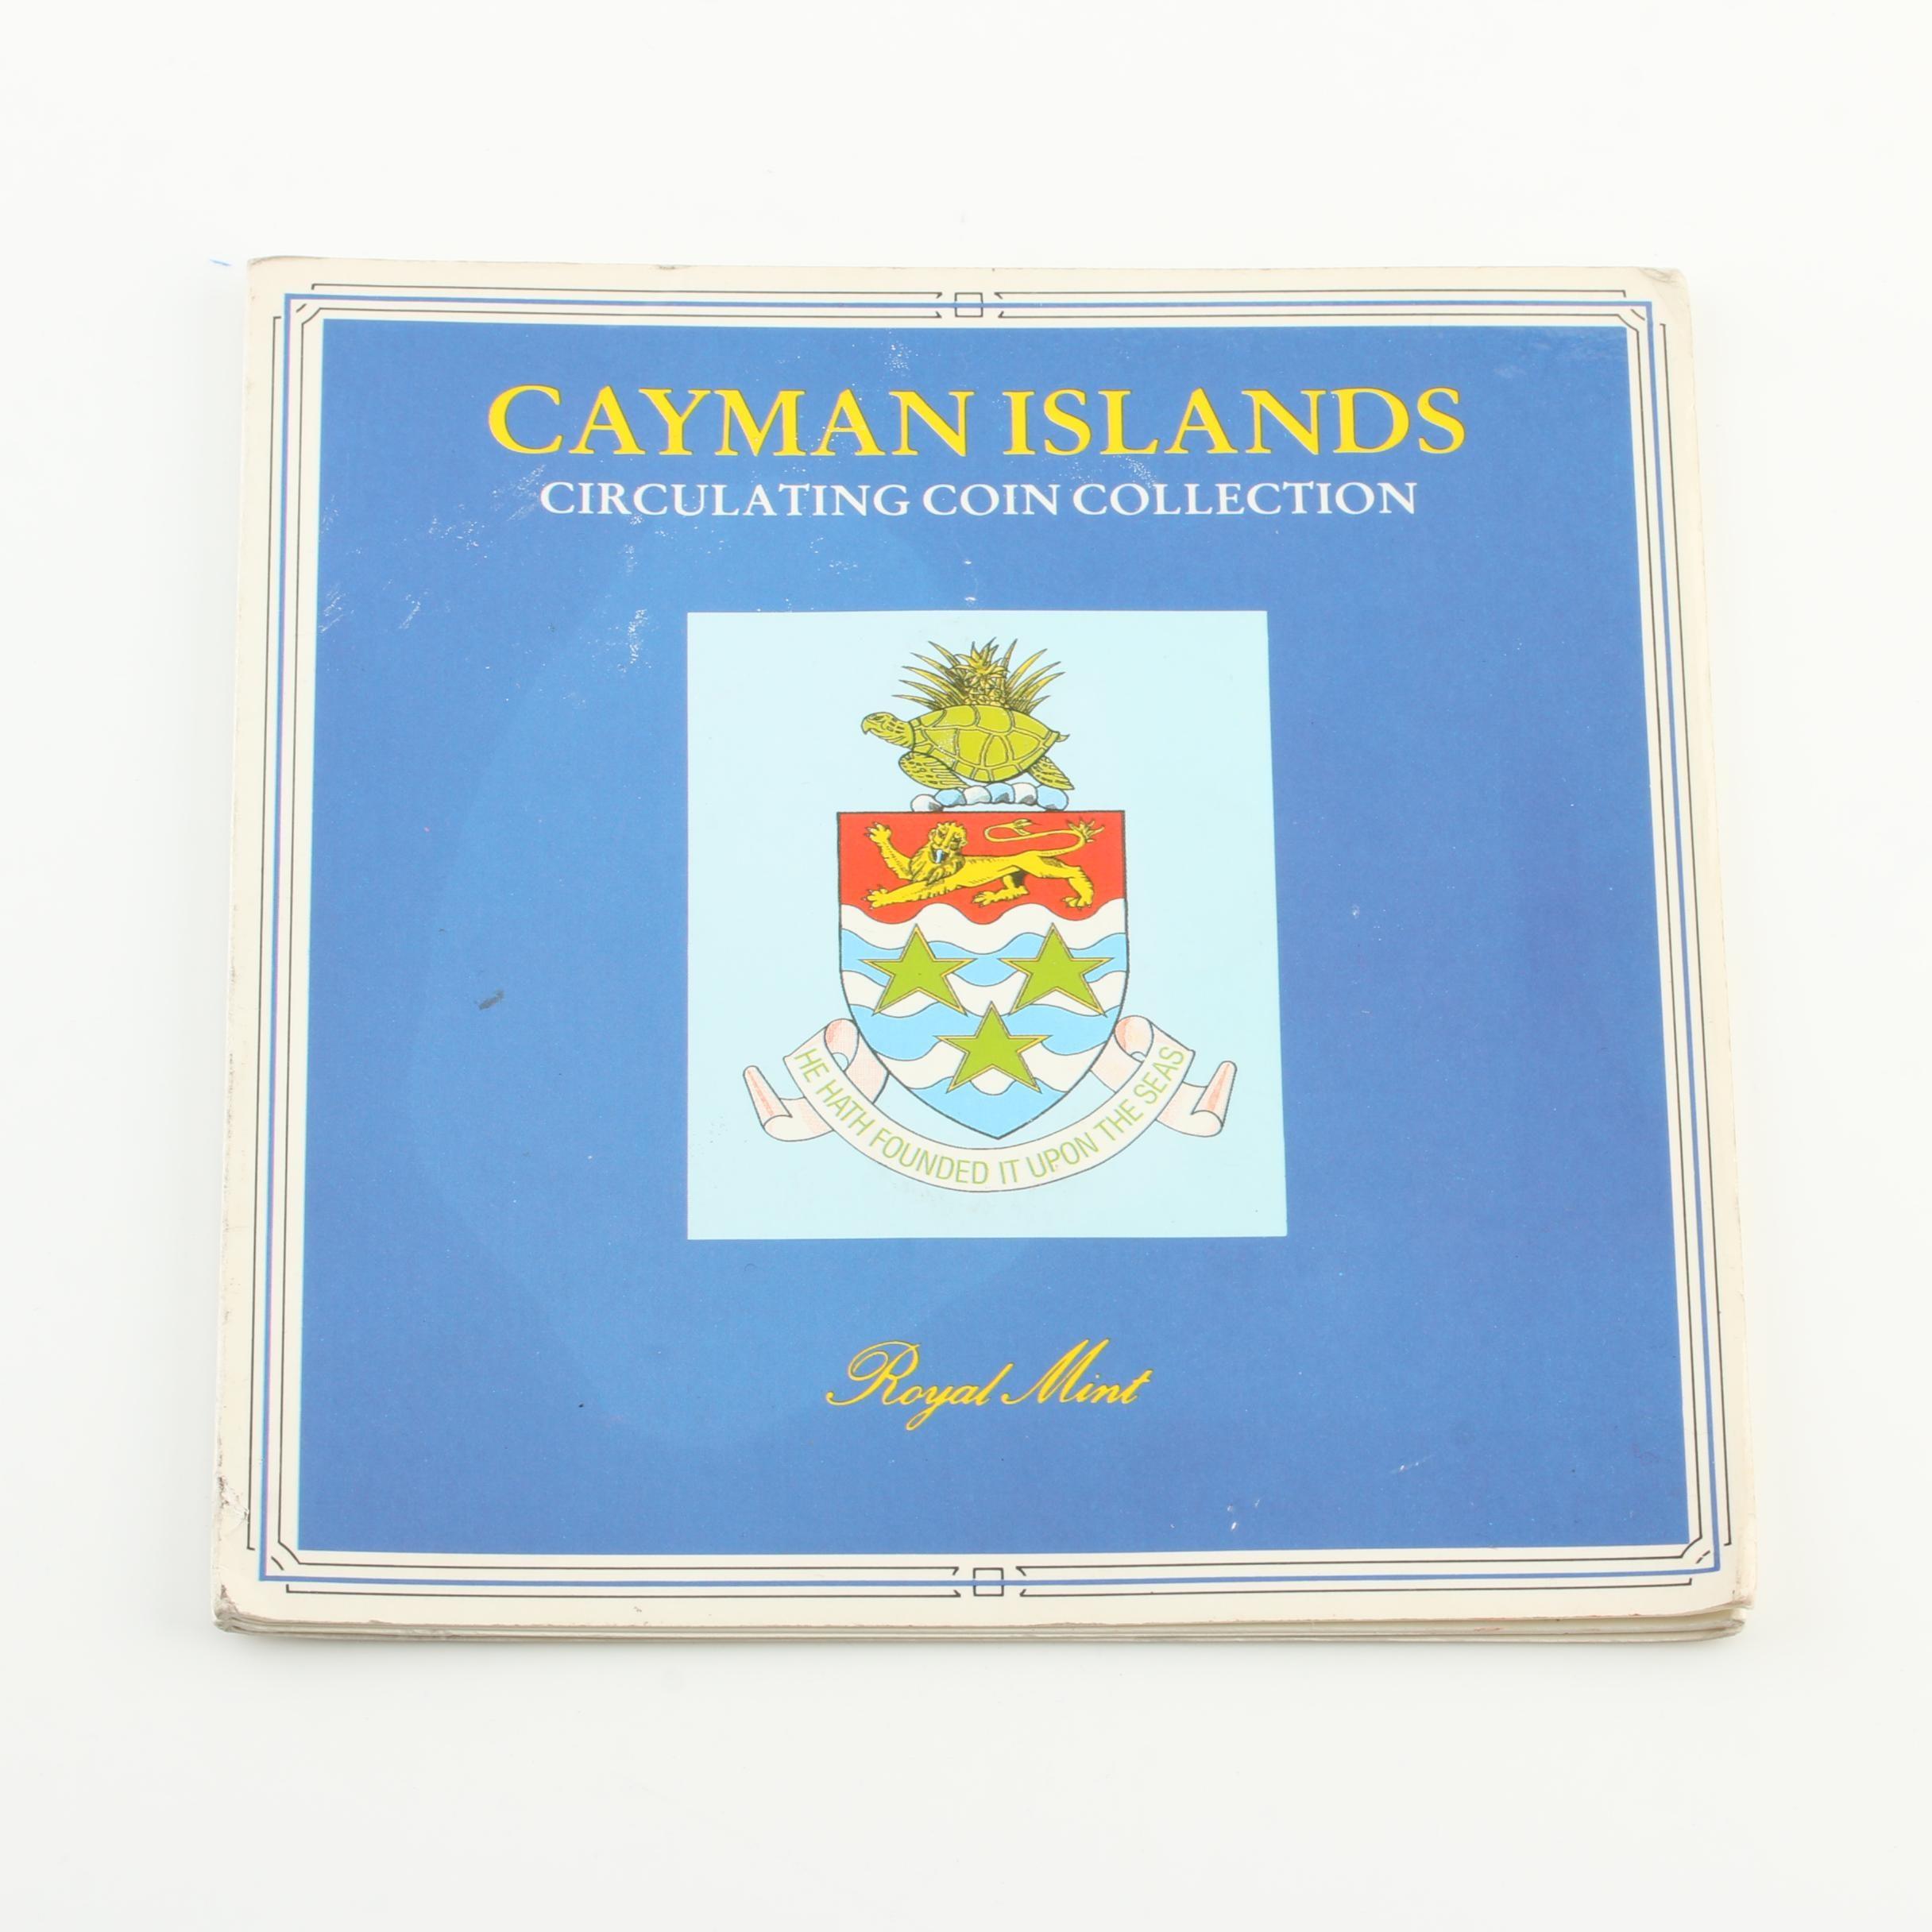 1987 Cayman Islands Circulating Coin Collection Set